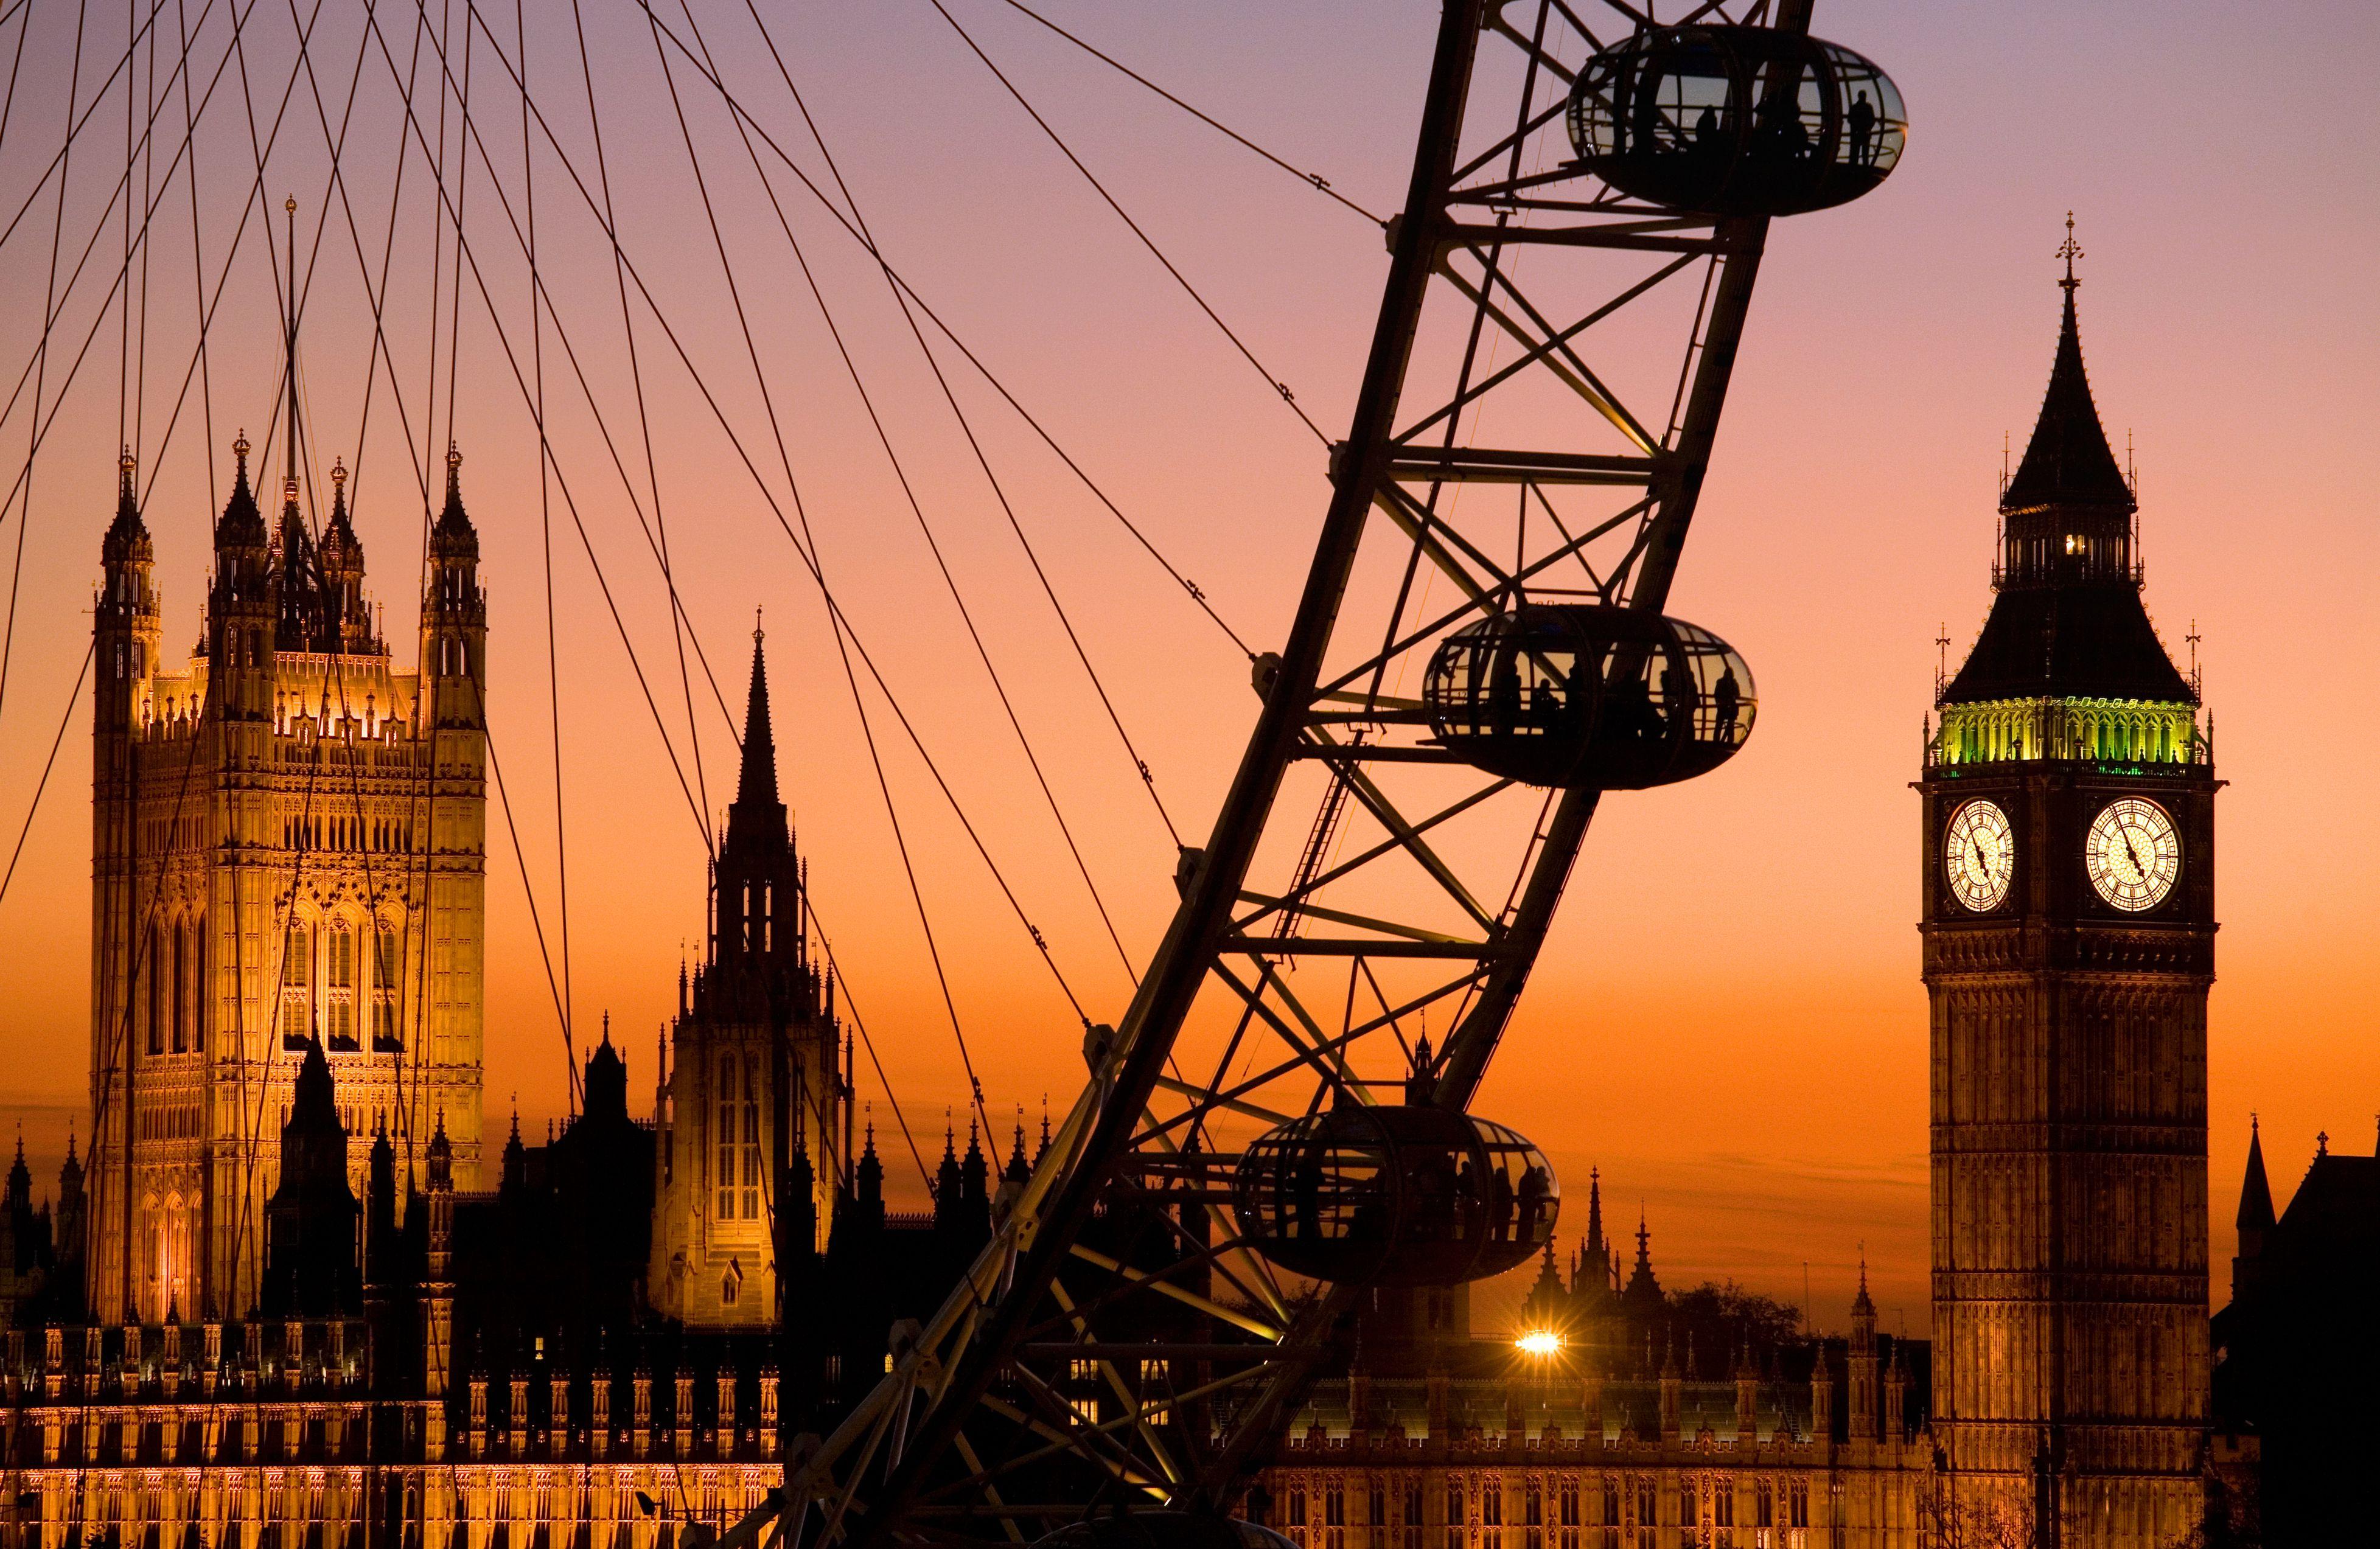 London Eye and Big Ben at dusk, Westminster, London, England